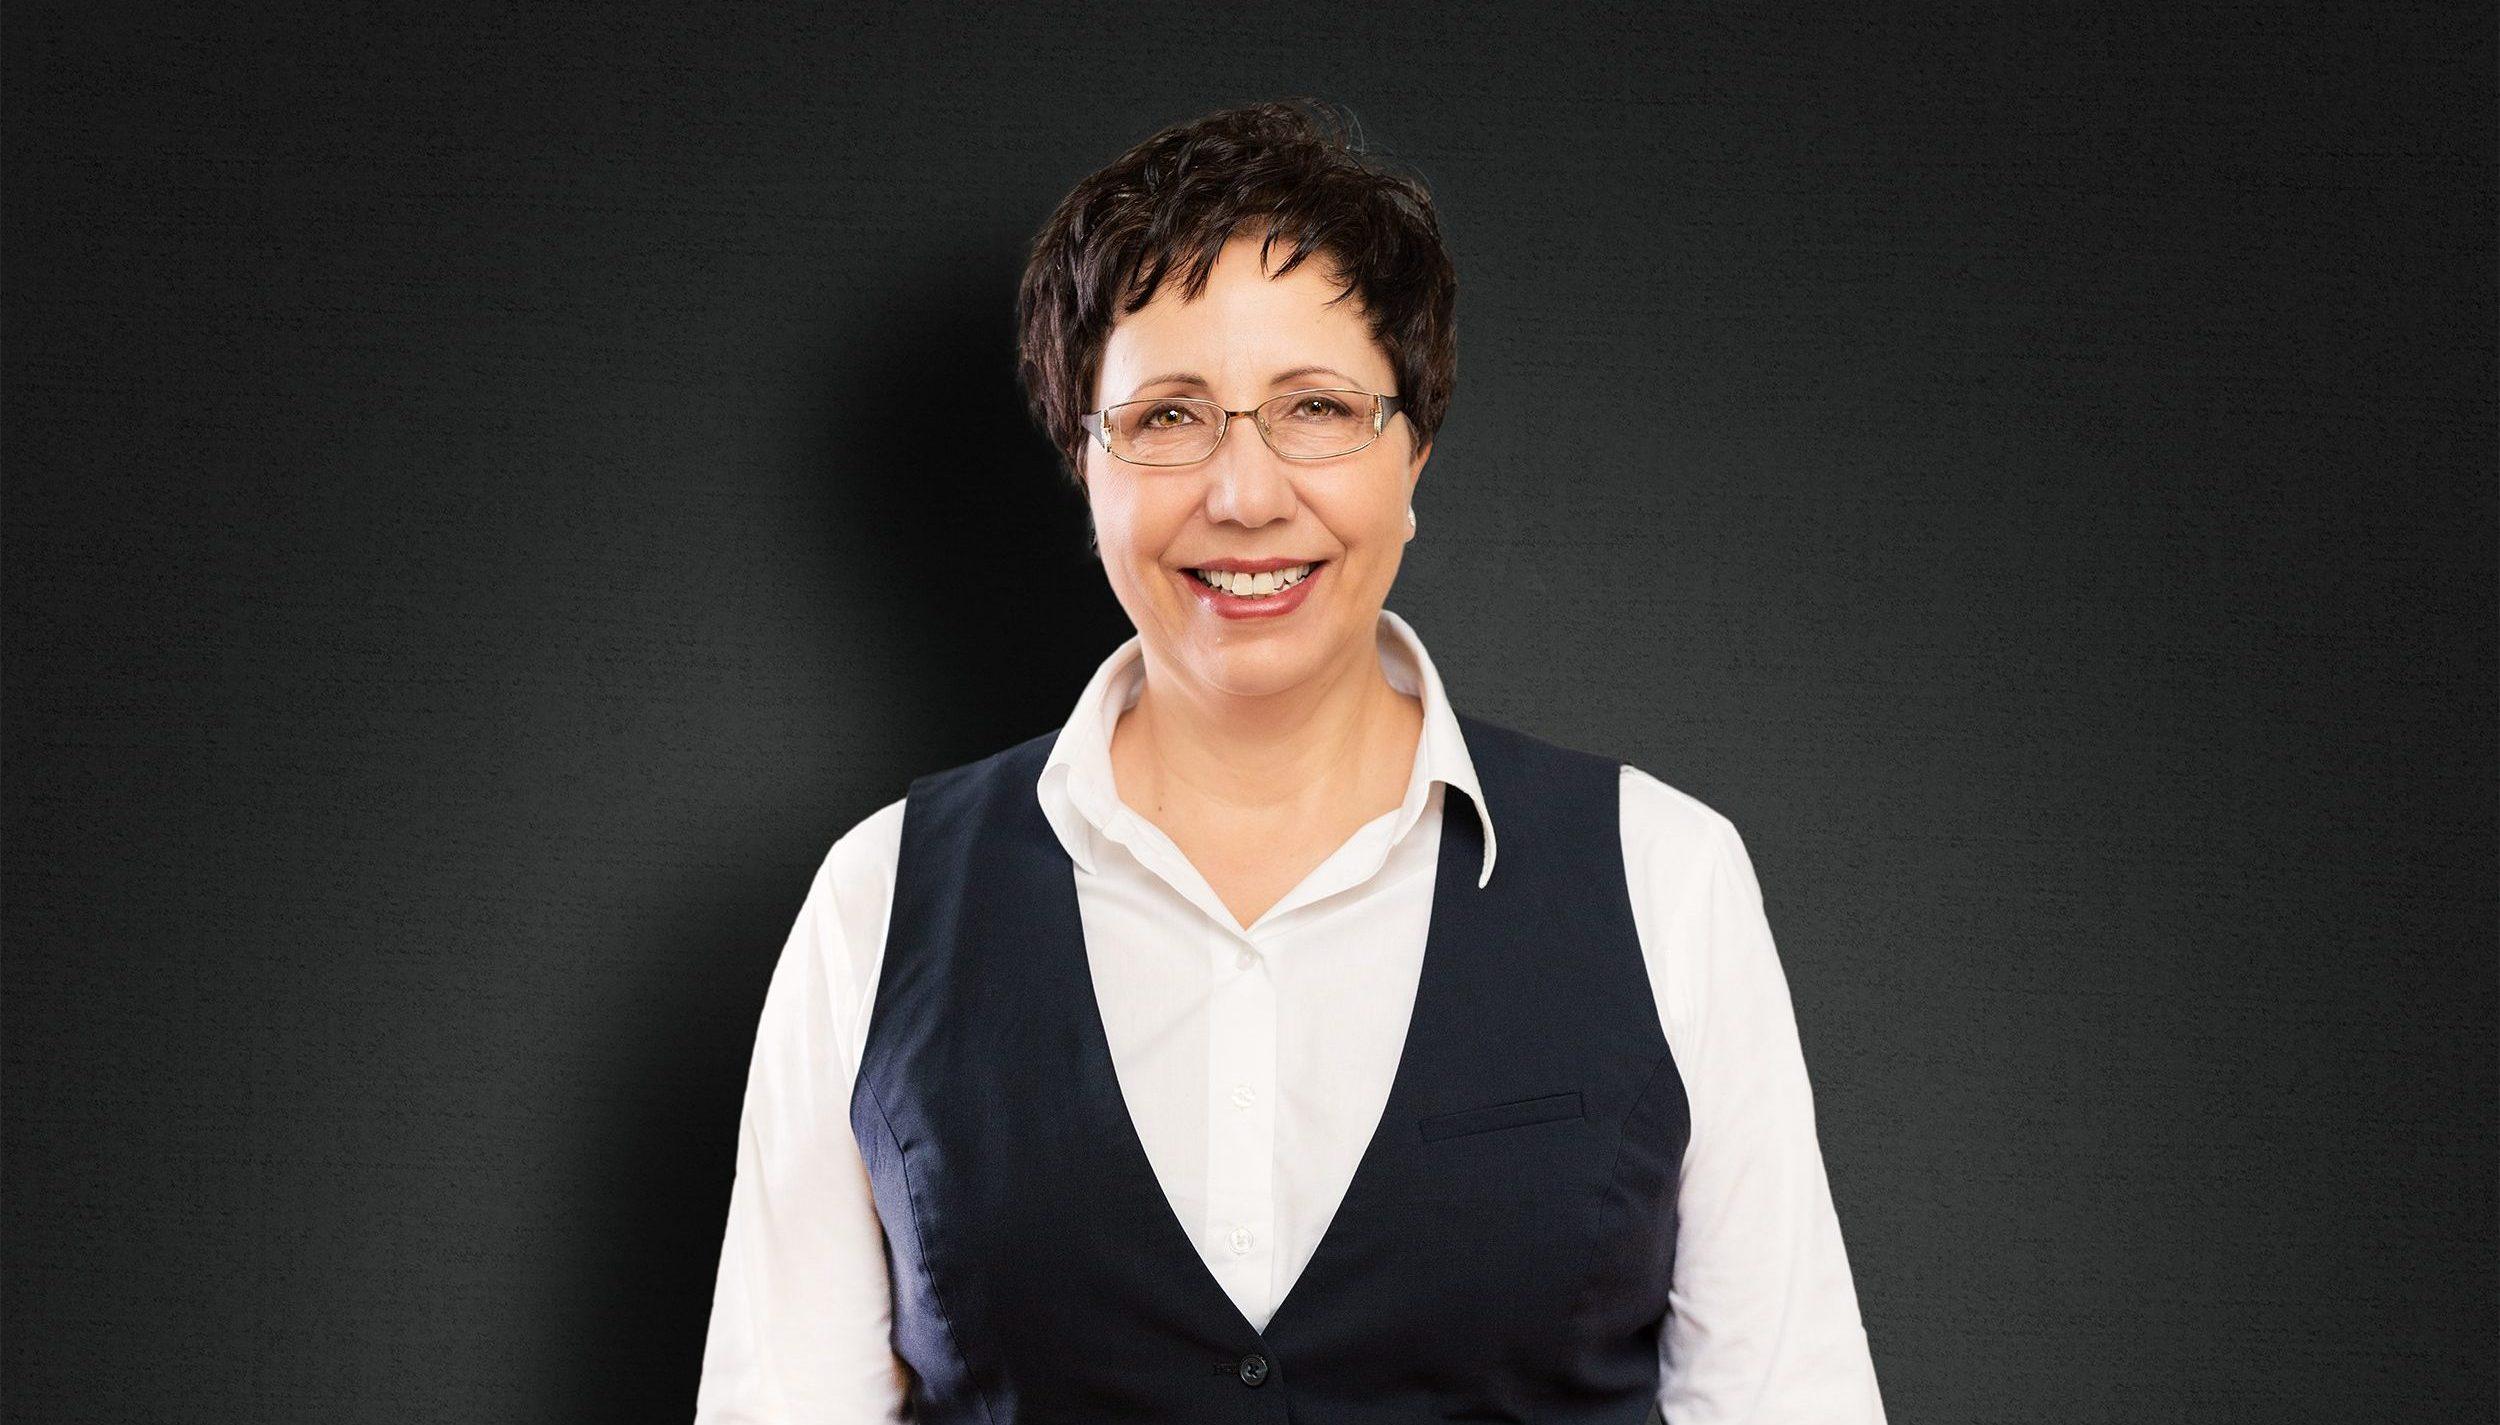 Silvia Fleckenstein